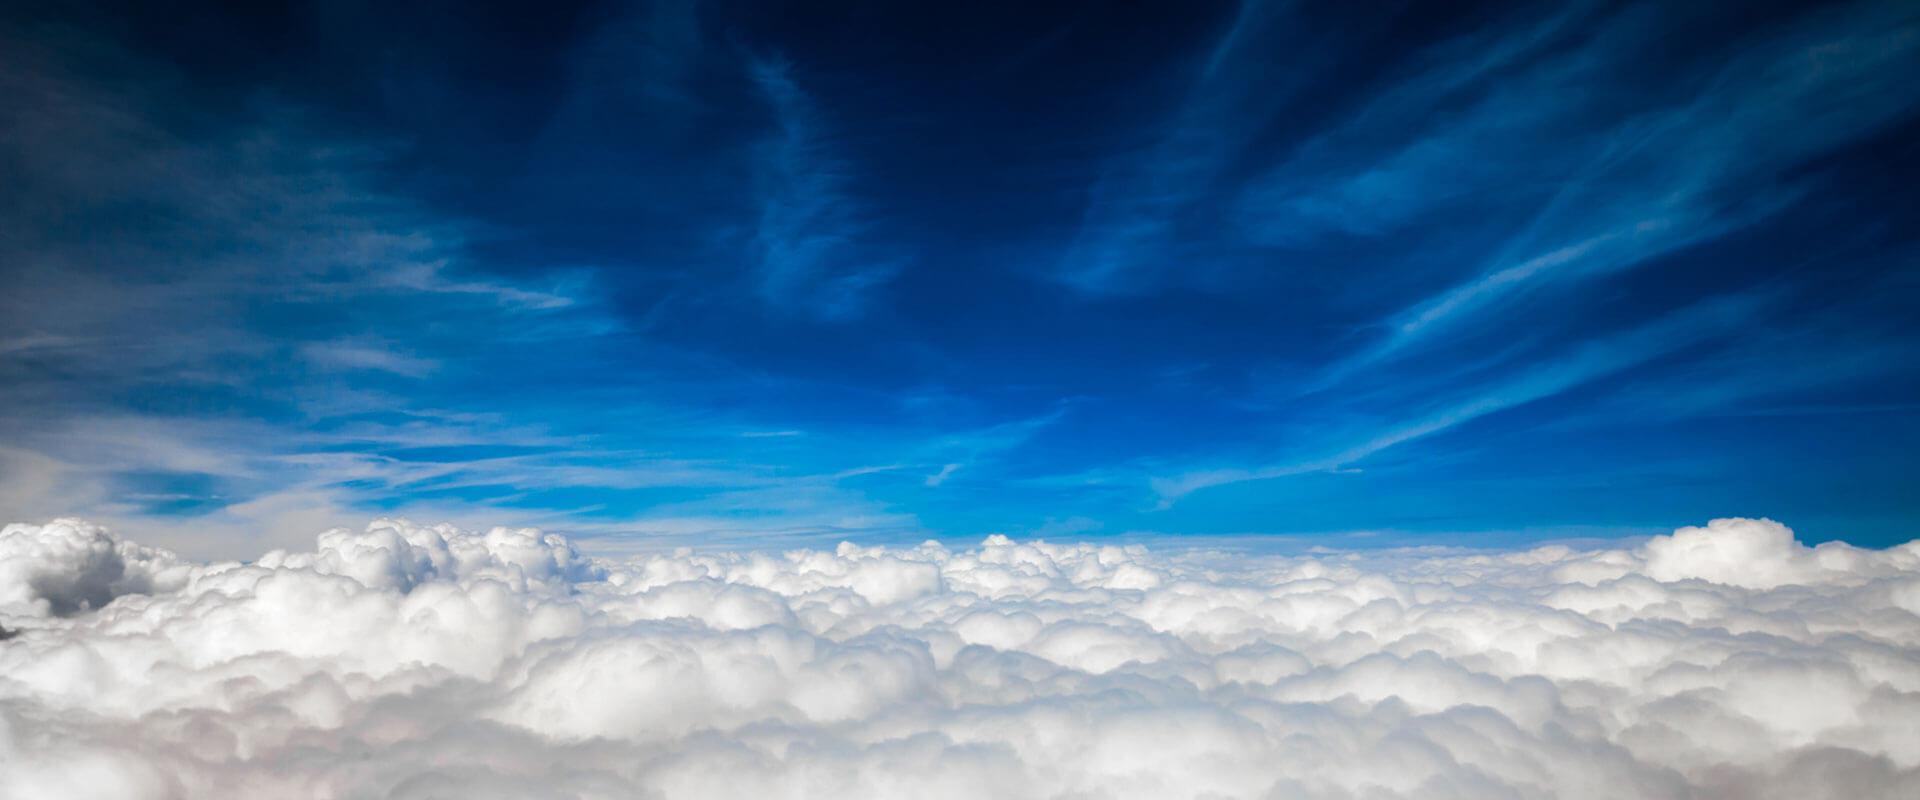 showcase_clouds_bk.jpg - 99.25 kB